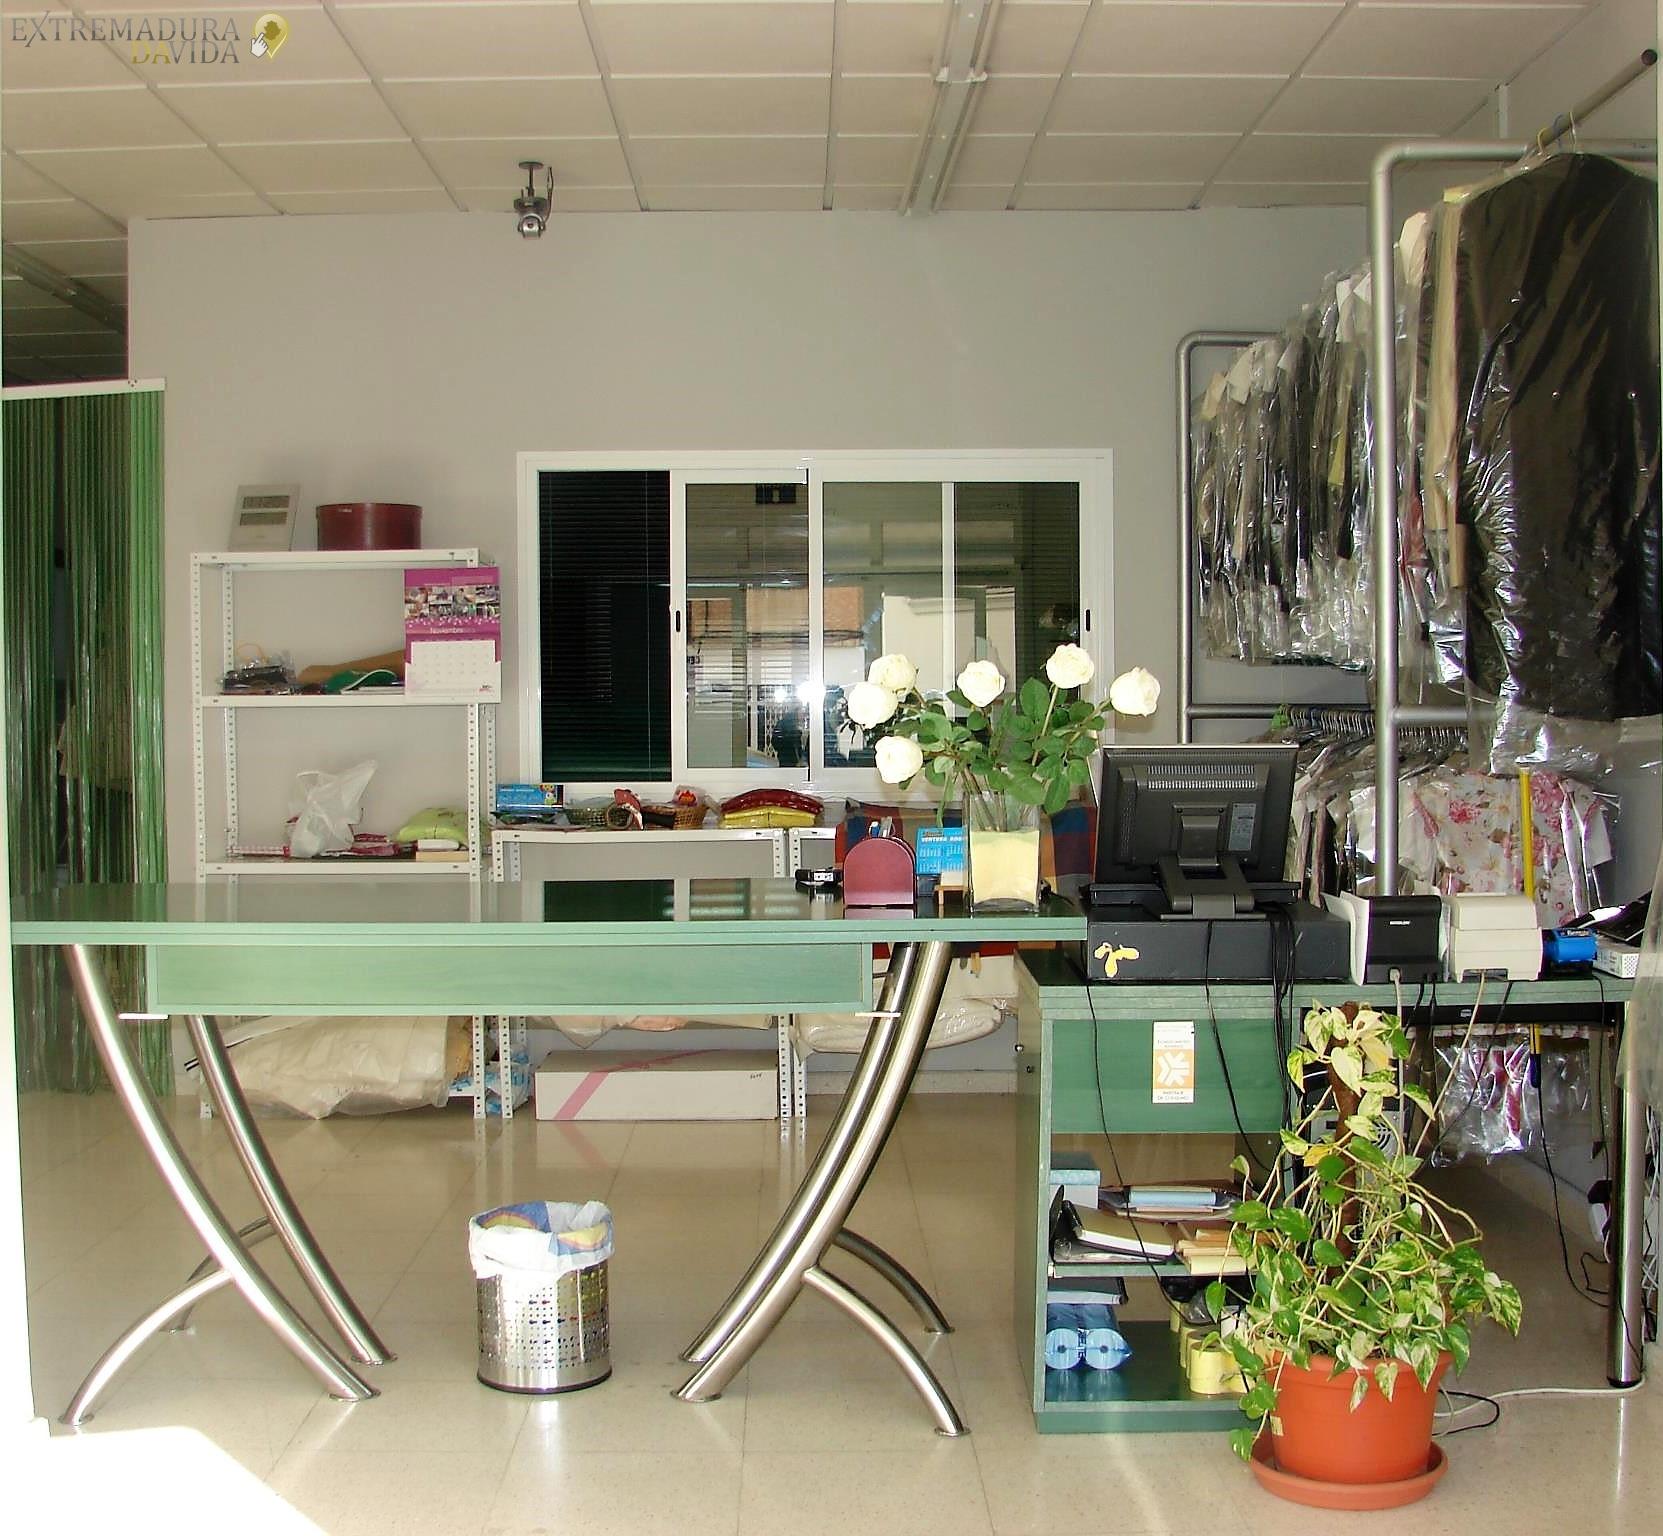 tintoreria-lavanderia almendralejo helena